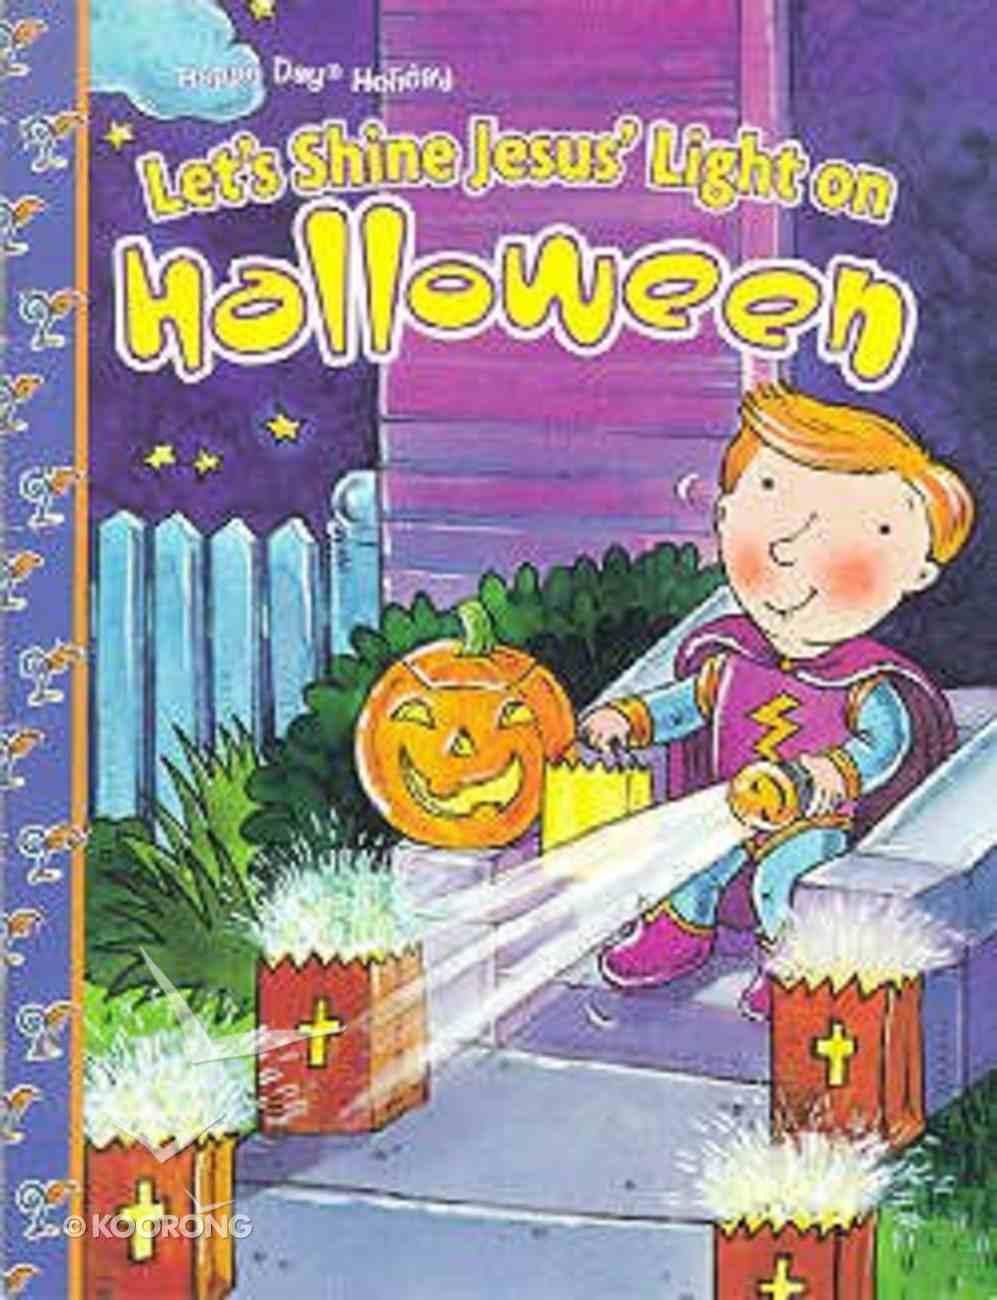 Let's Shine Jesus' Light on Halloween (Happy Day Series) Paperback